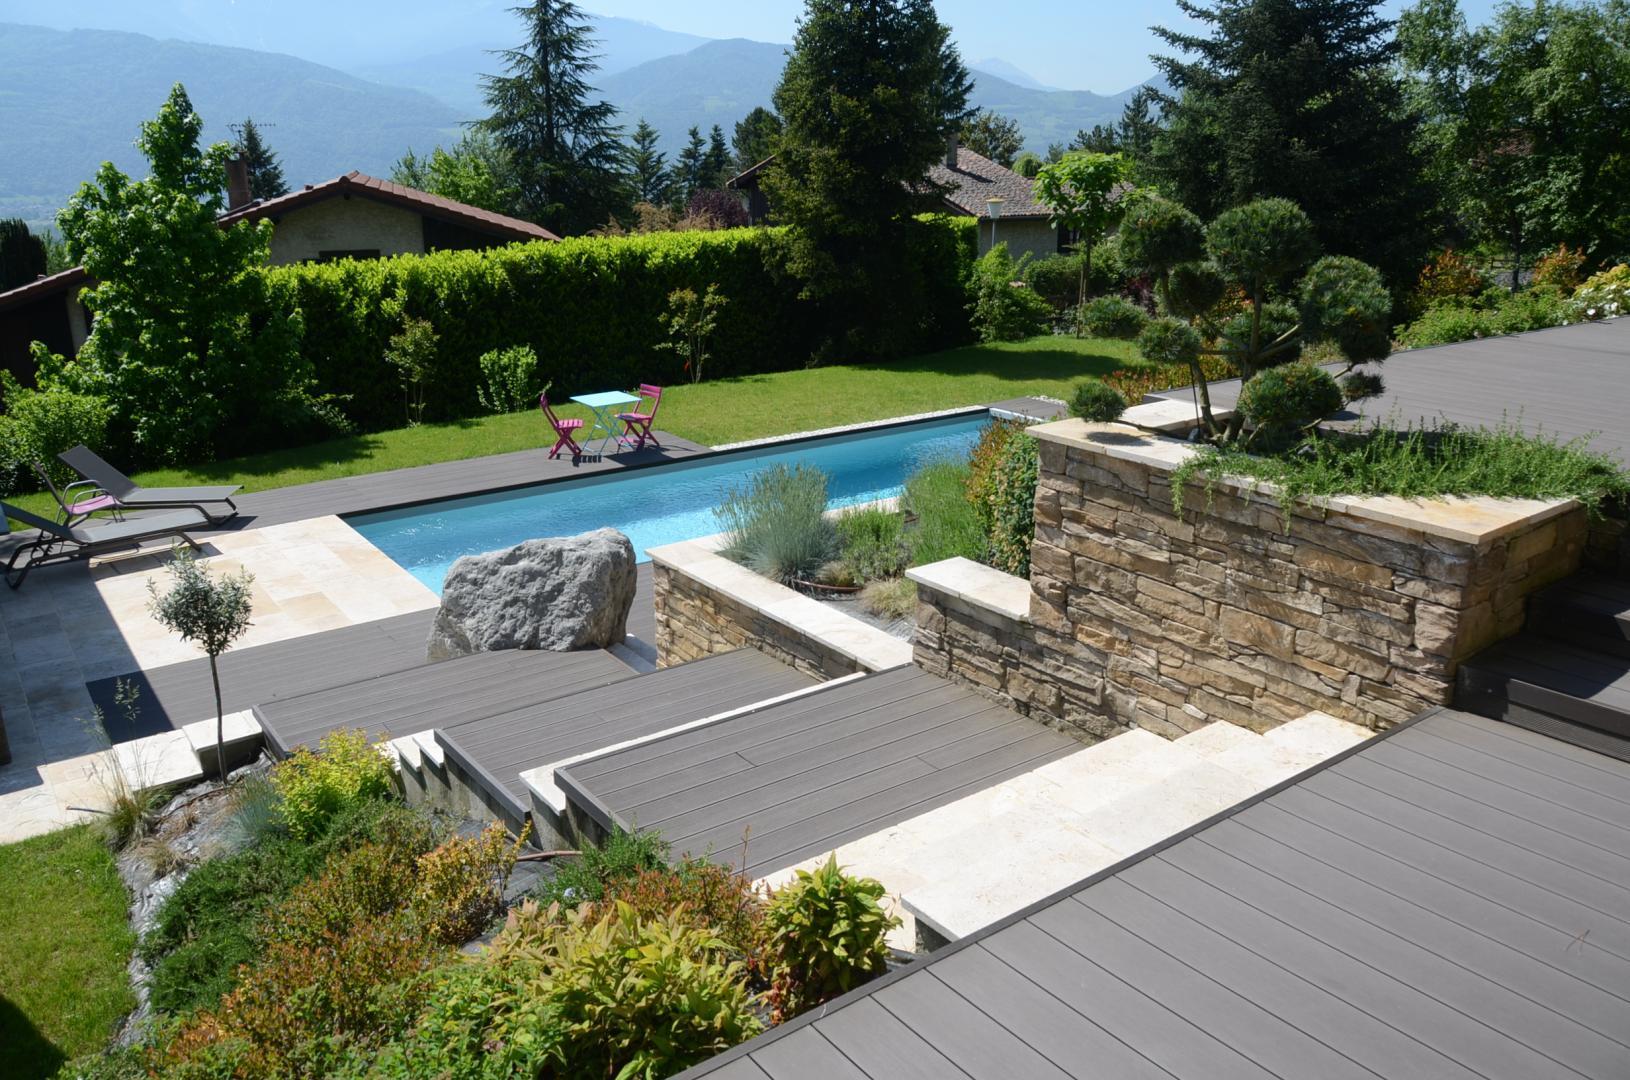 paysagiste saint ismier la tronche meylan piscine. Black Bedroom Furniture Sets. Home Design Ideas